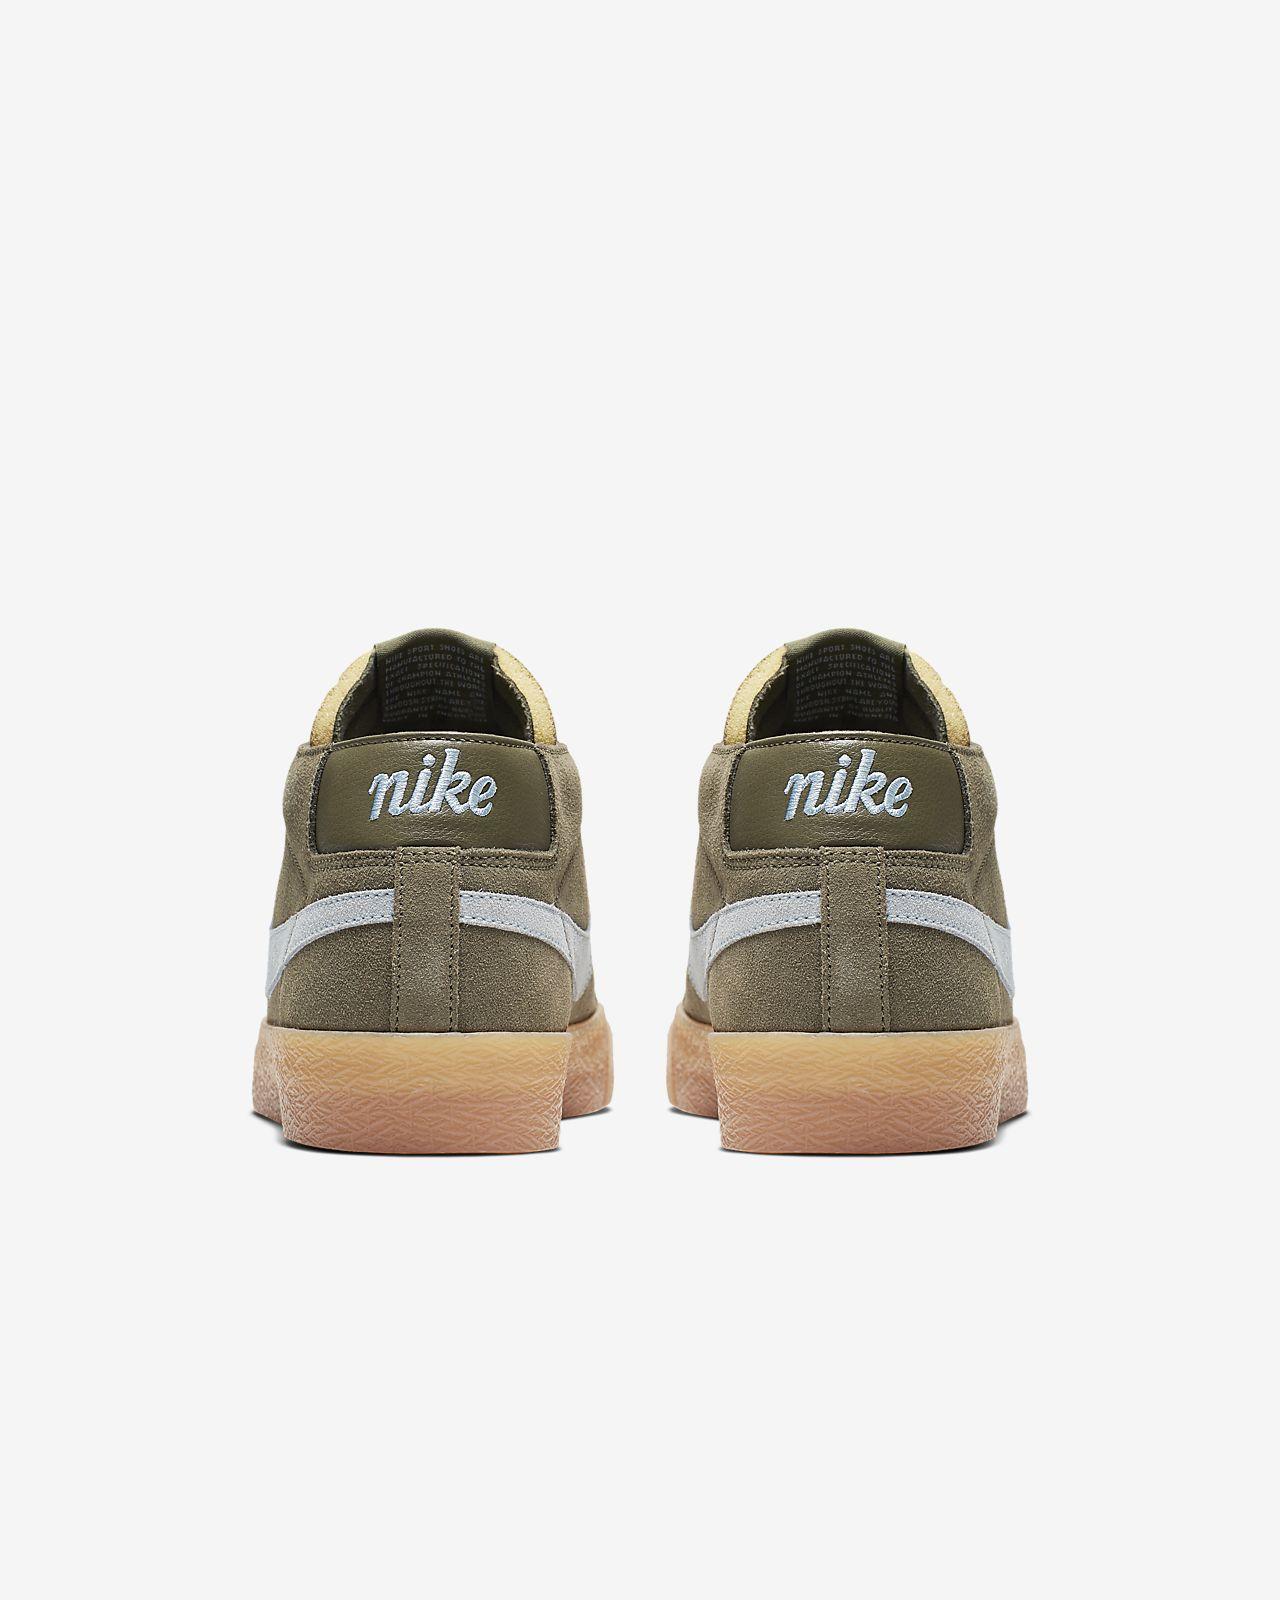 brand new ee95a 54204 ... Skateboardsko Nike SB Zoom Blazer Chukka för män